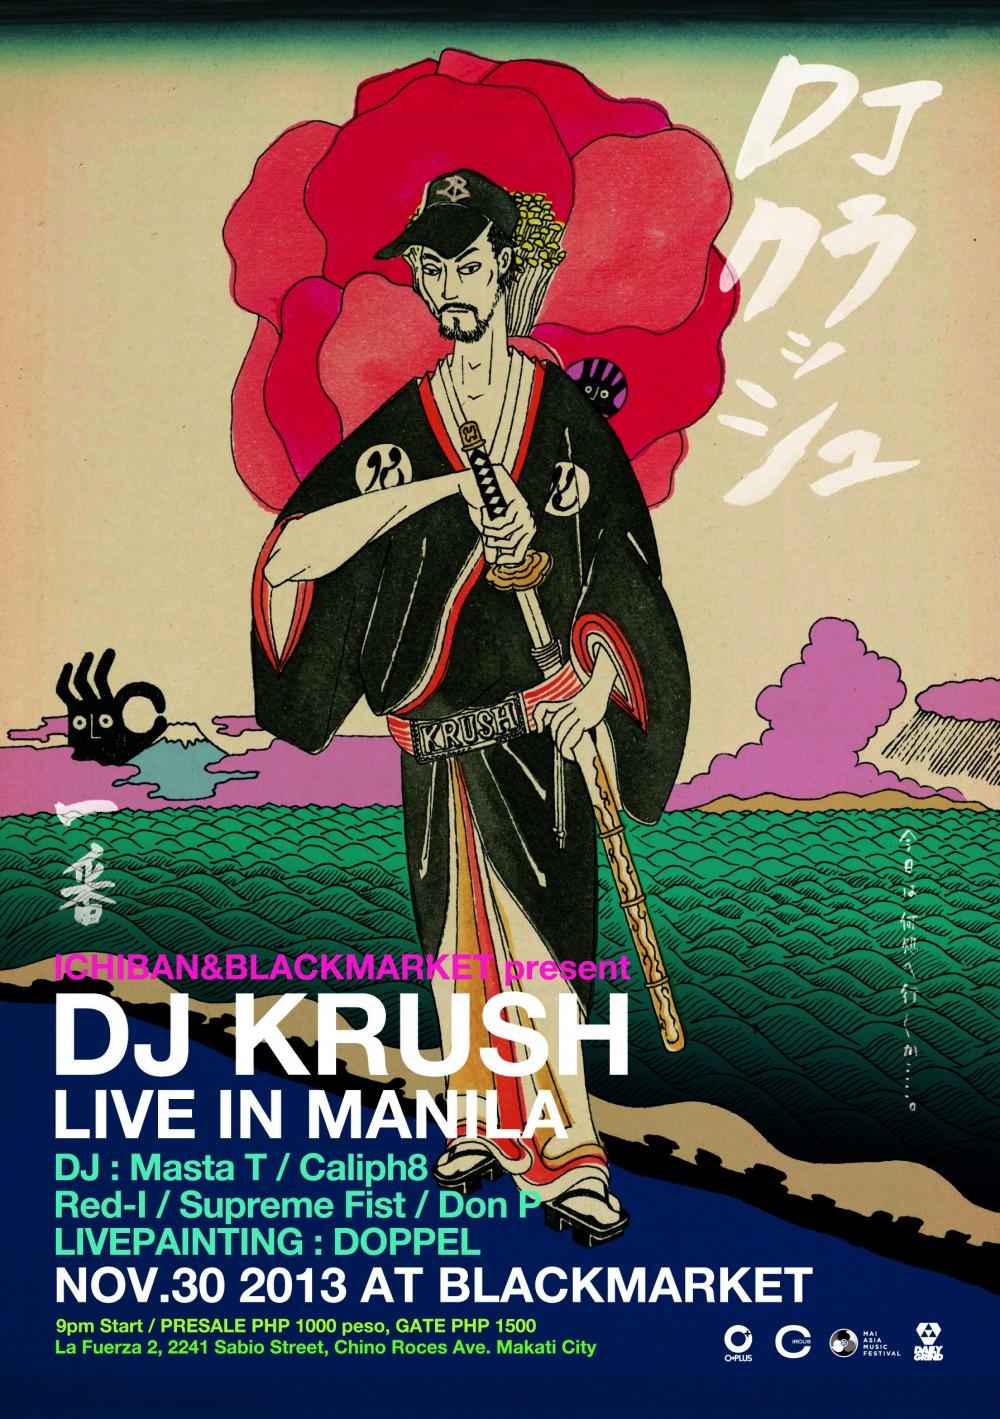 DJ KRUSHom